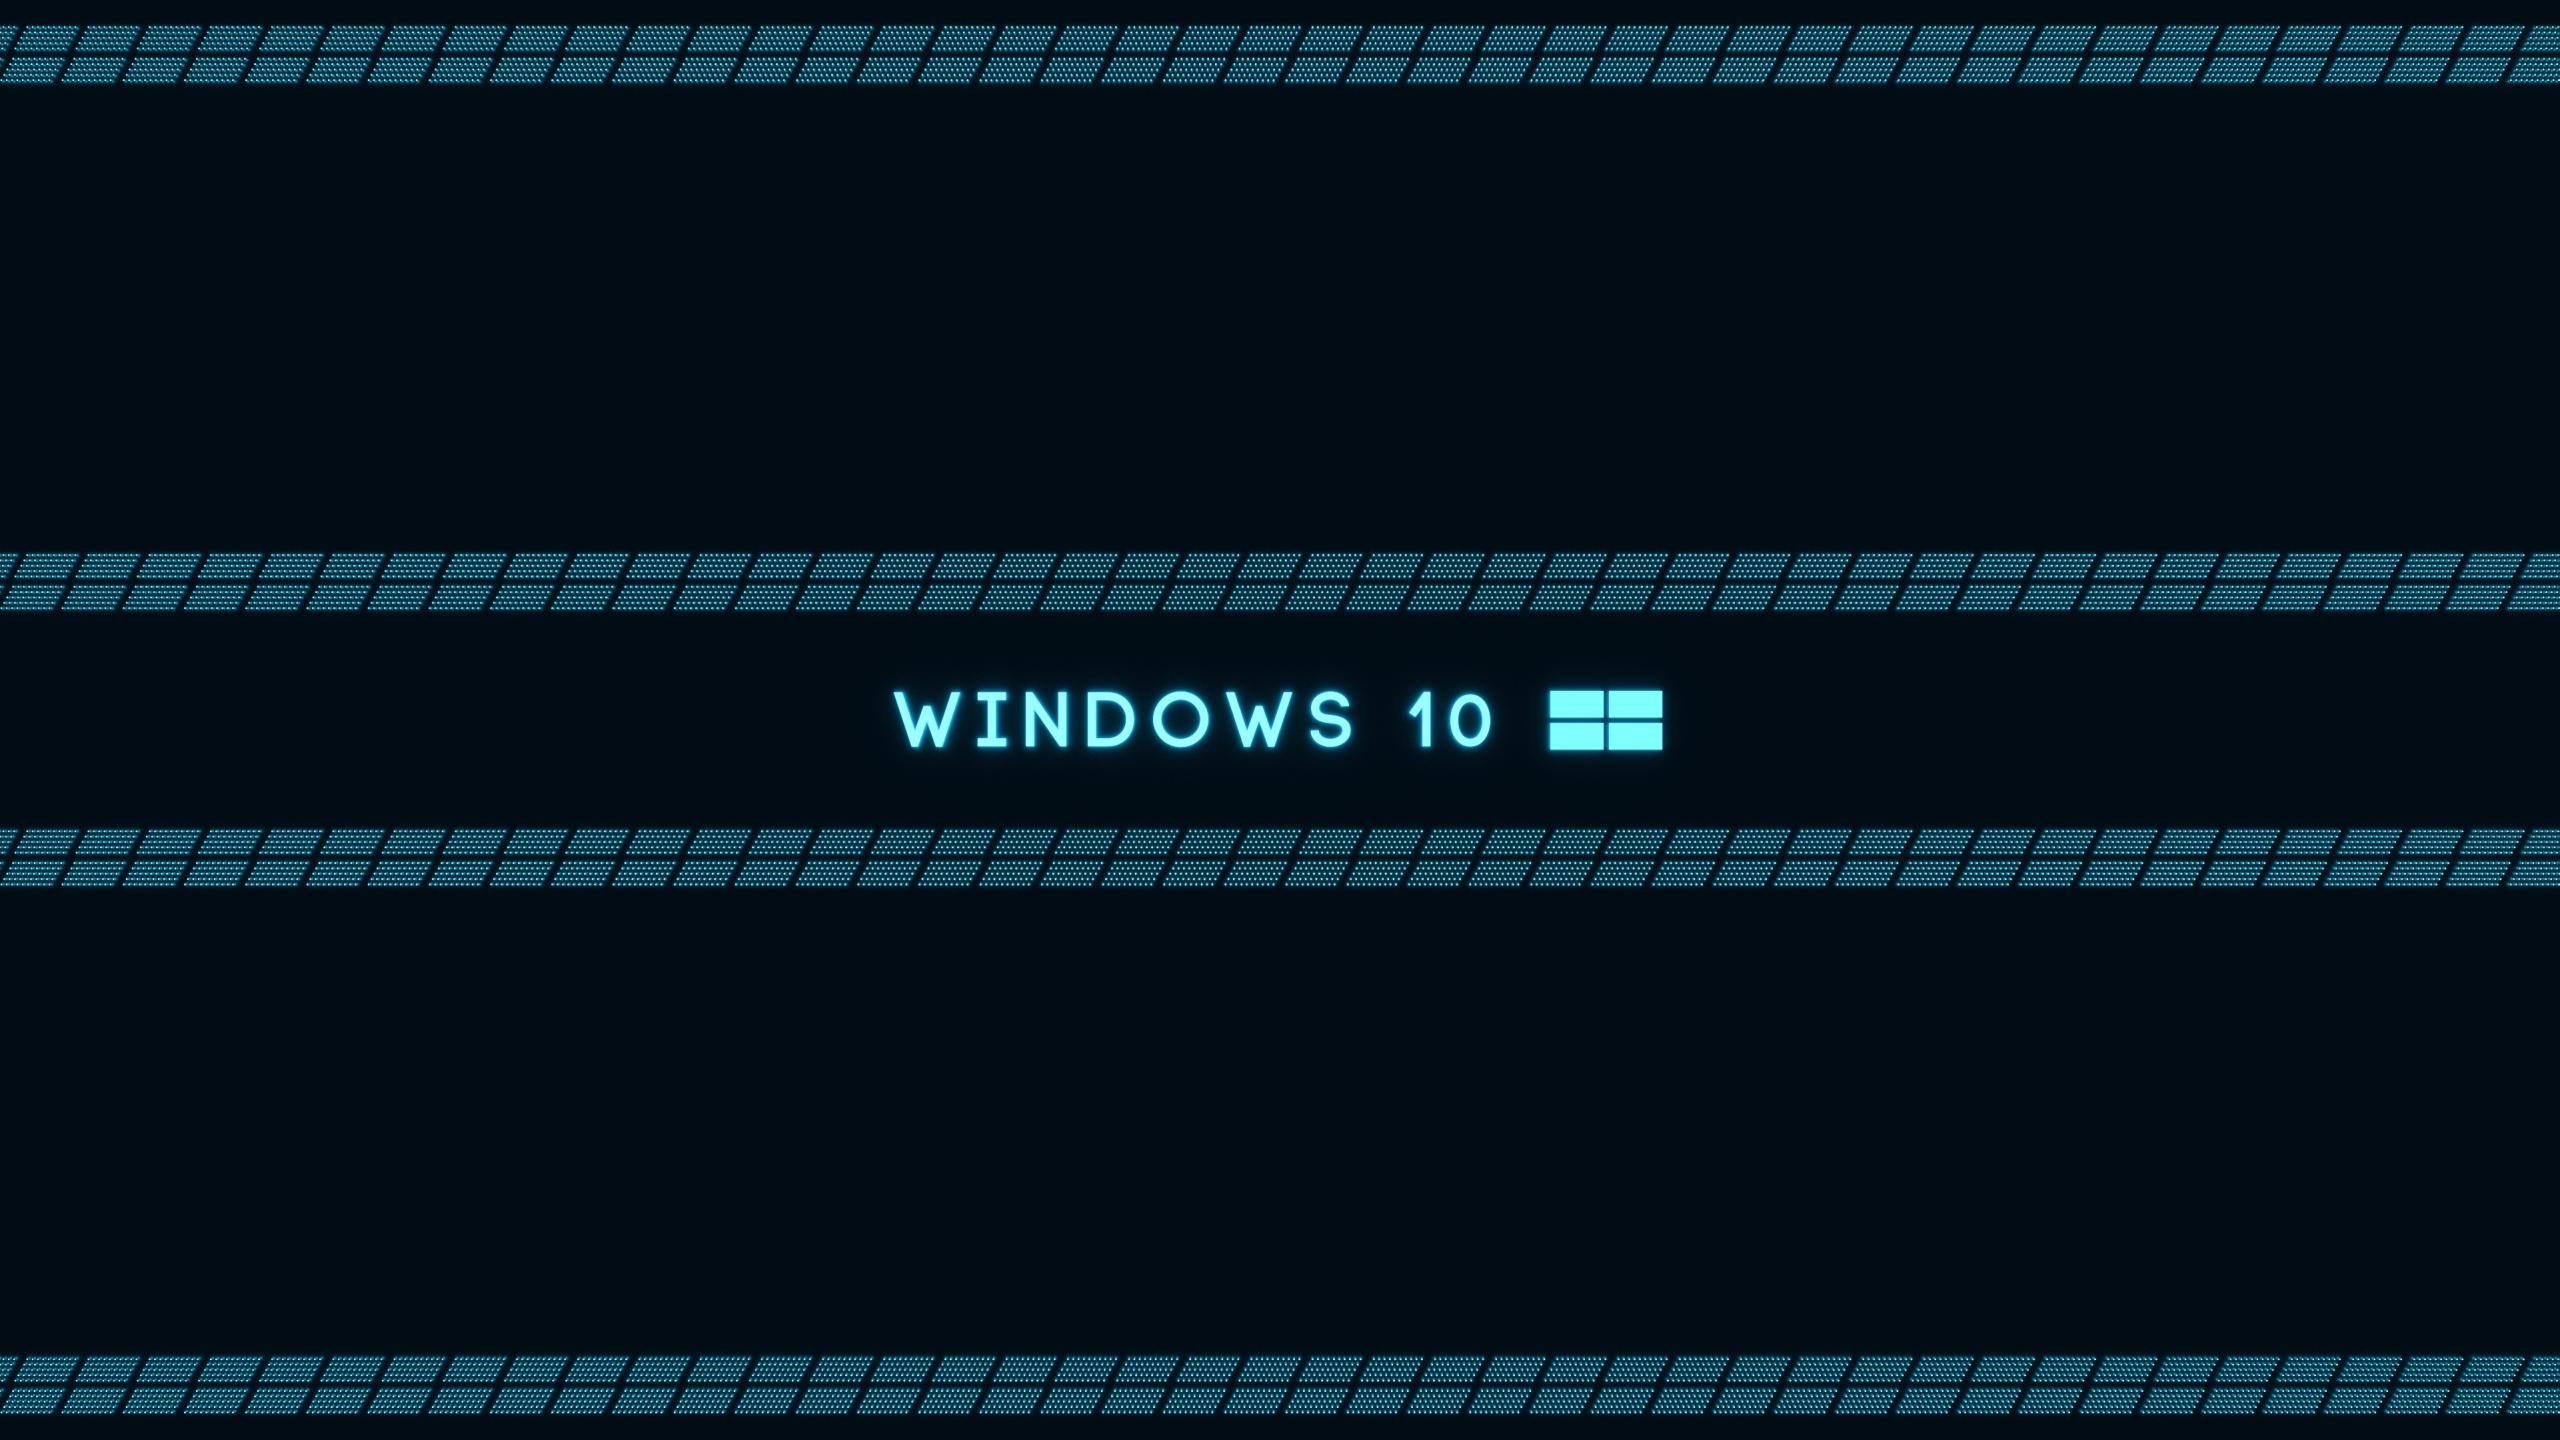 2560x1440 Microsoft Windows 10 OS Blue desktop PC and Mac wallpaper 2560x1440